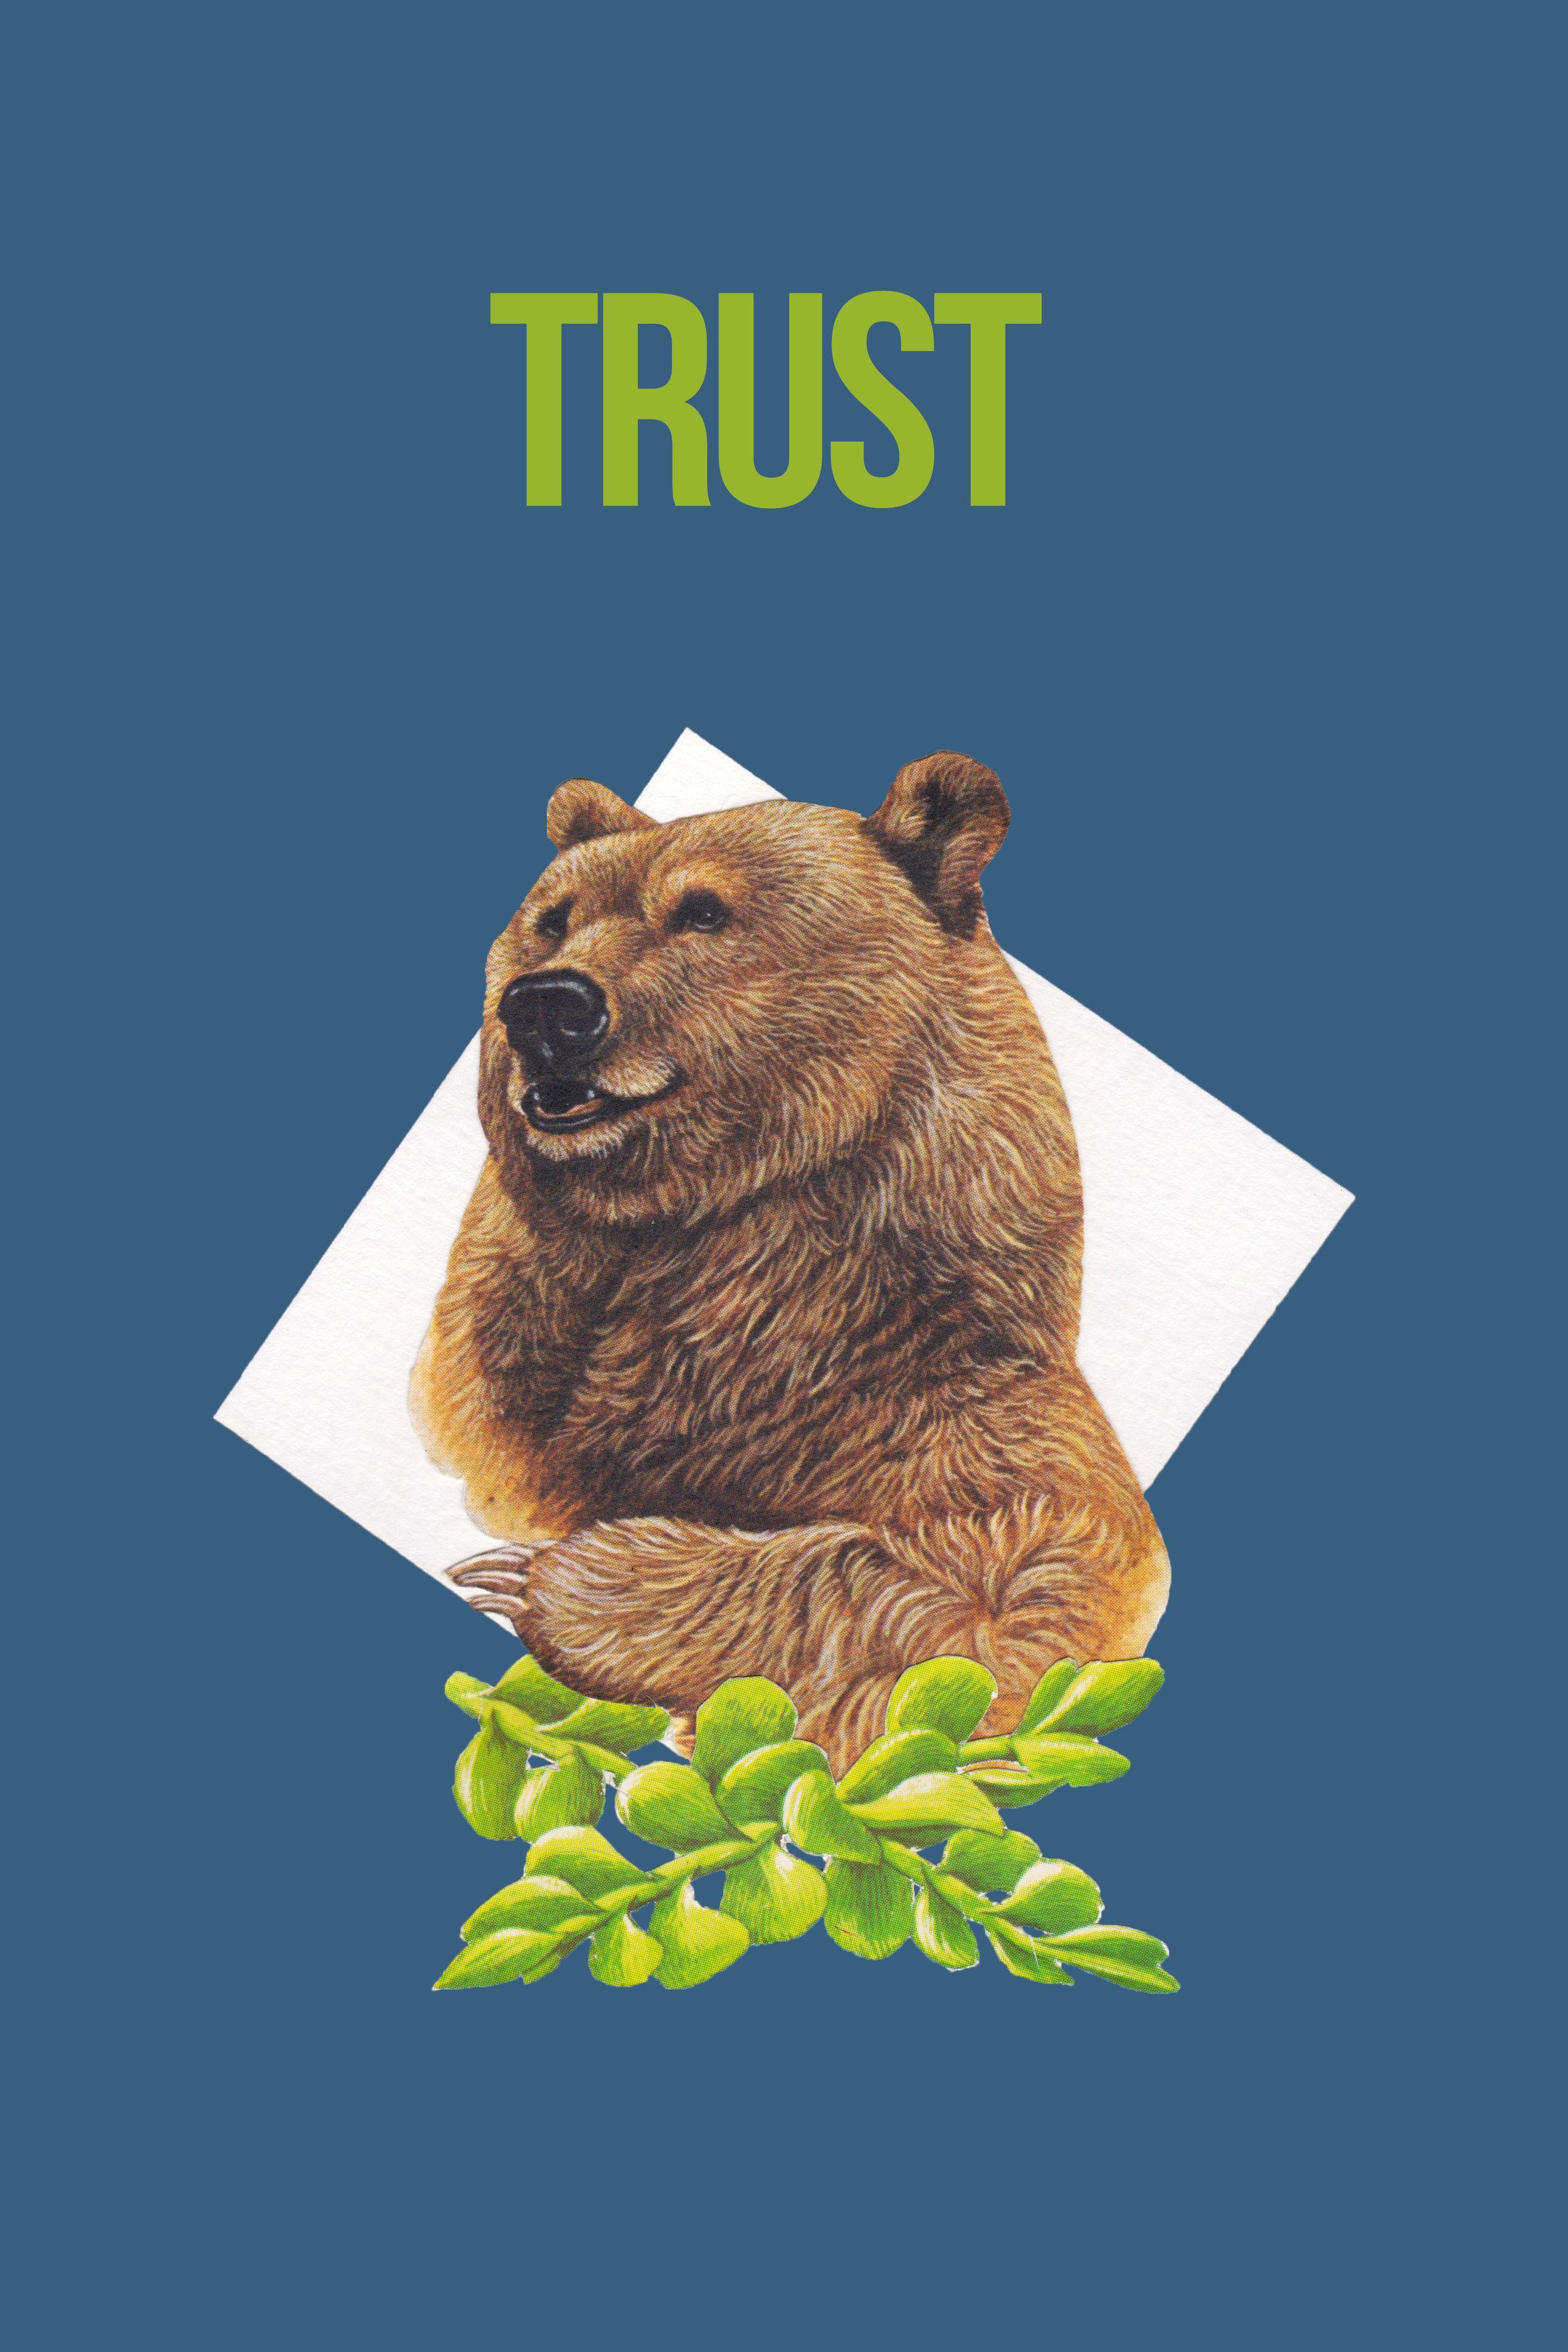 TRUST_c_small.jpg